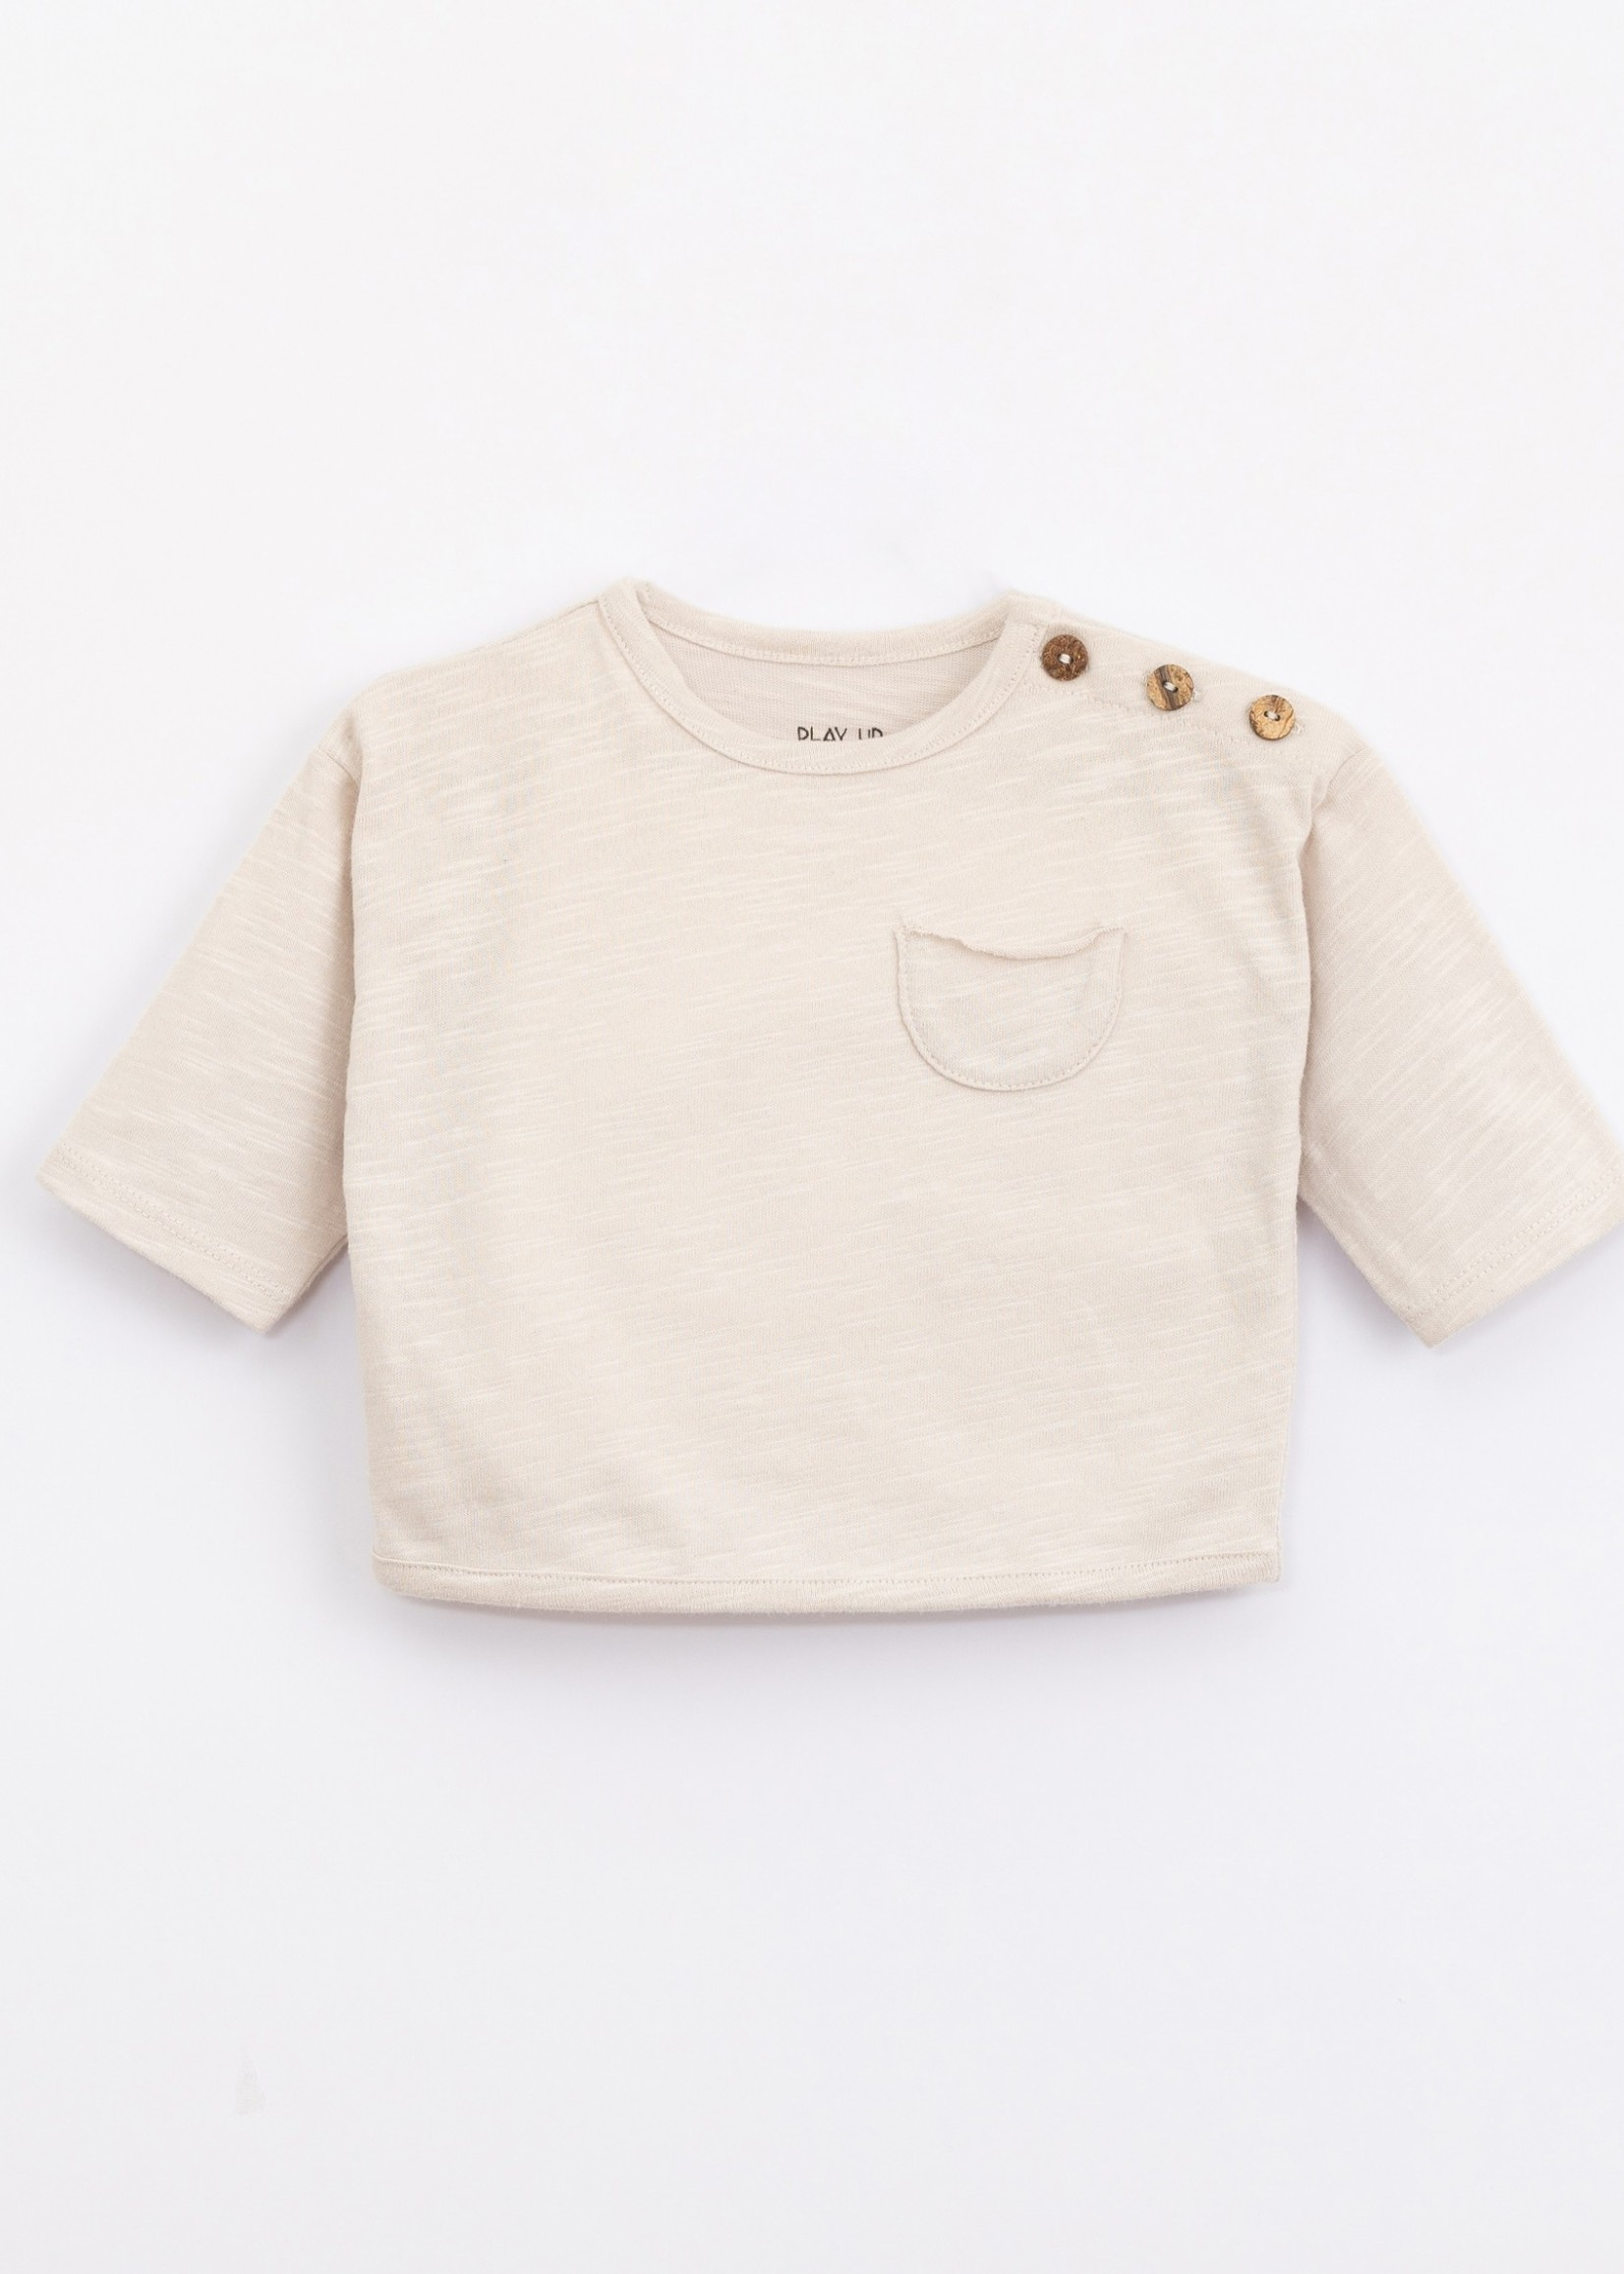 Play Up Long-sleeved T-shirt - Miro